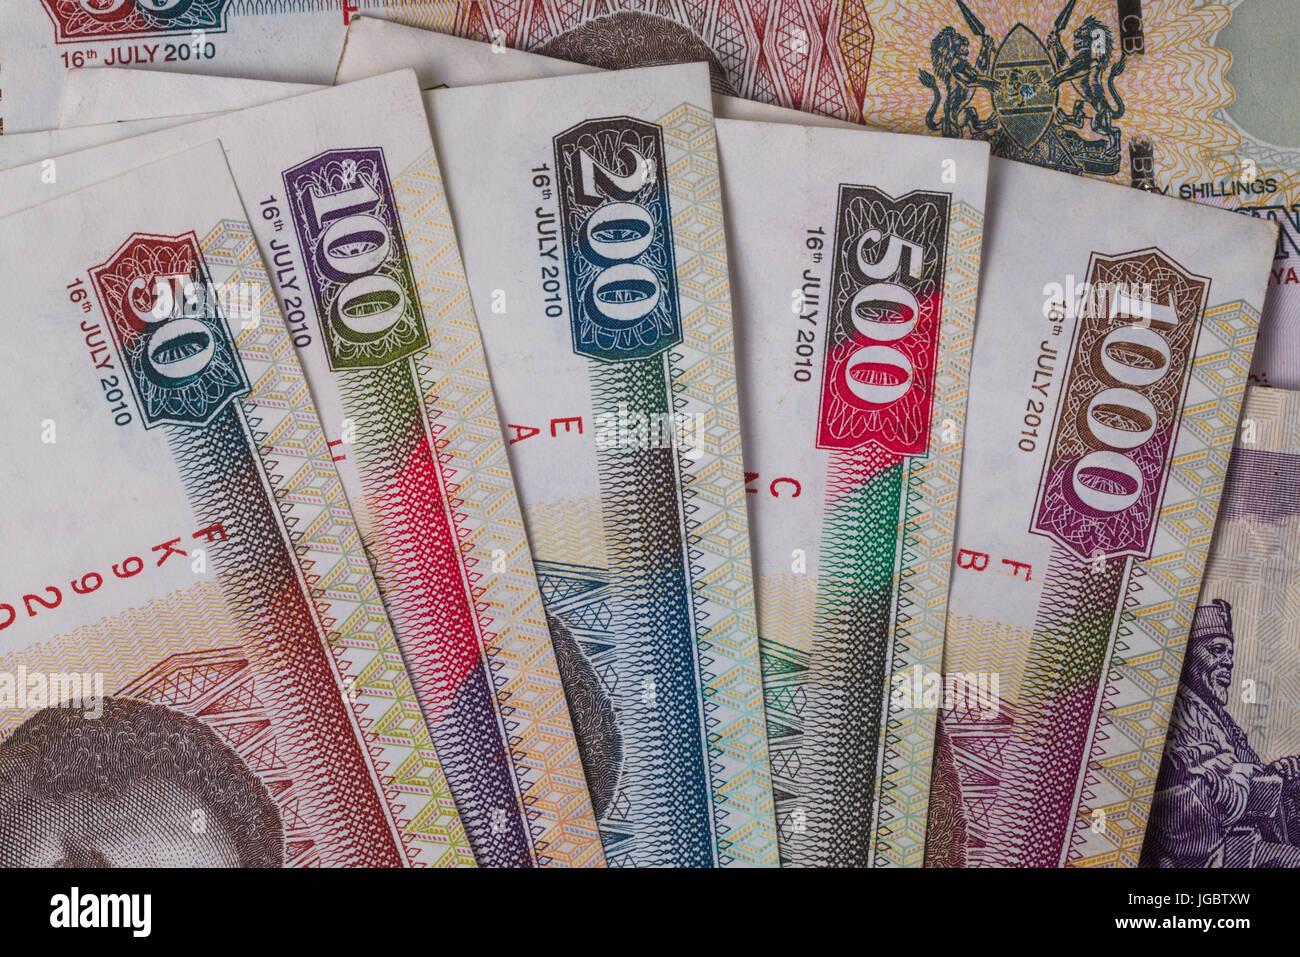 Kenyan Shilling Bank Notes In Various Denominations - Stock Image